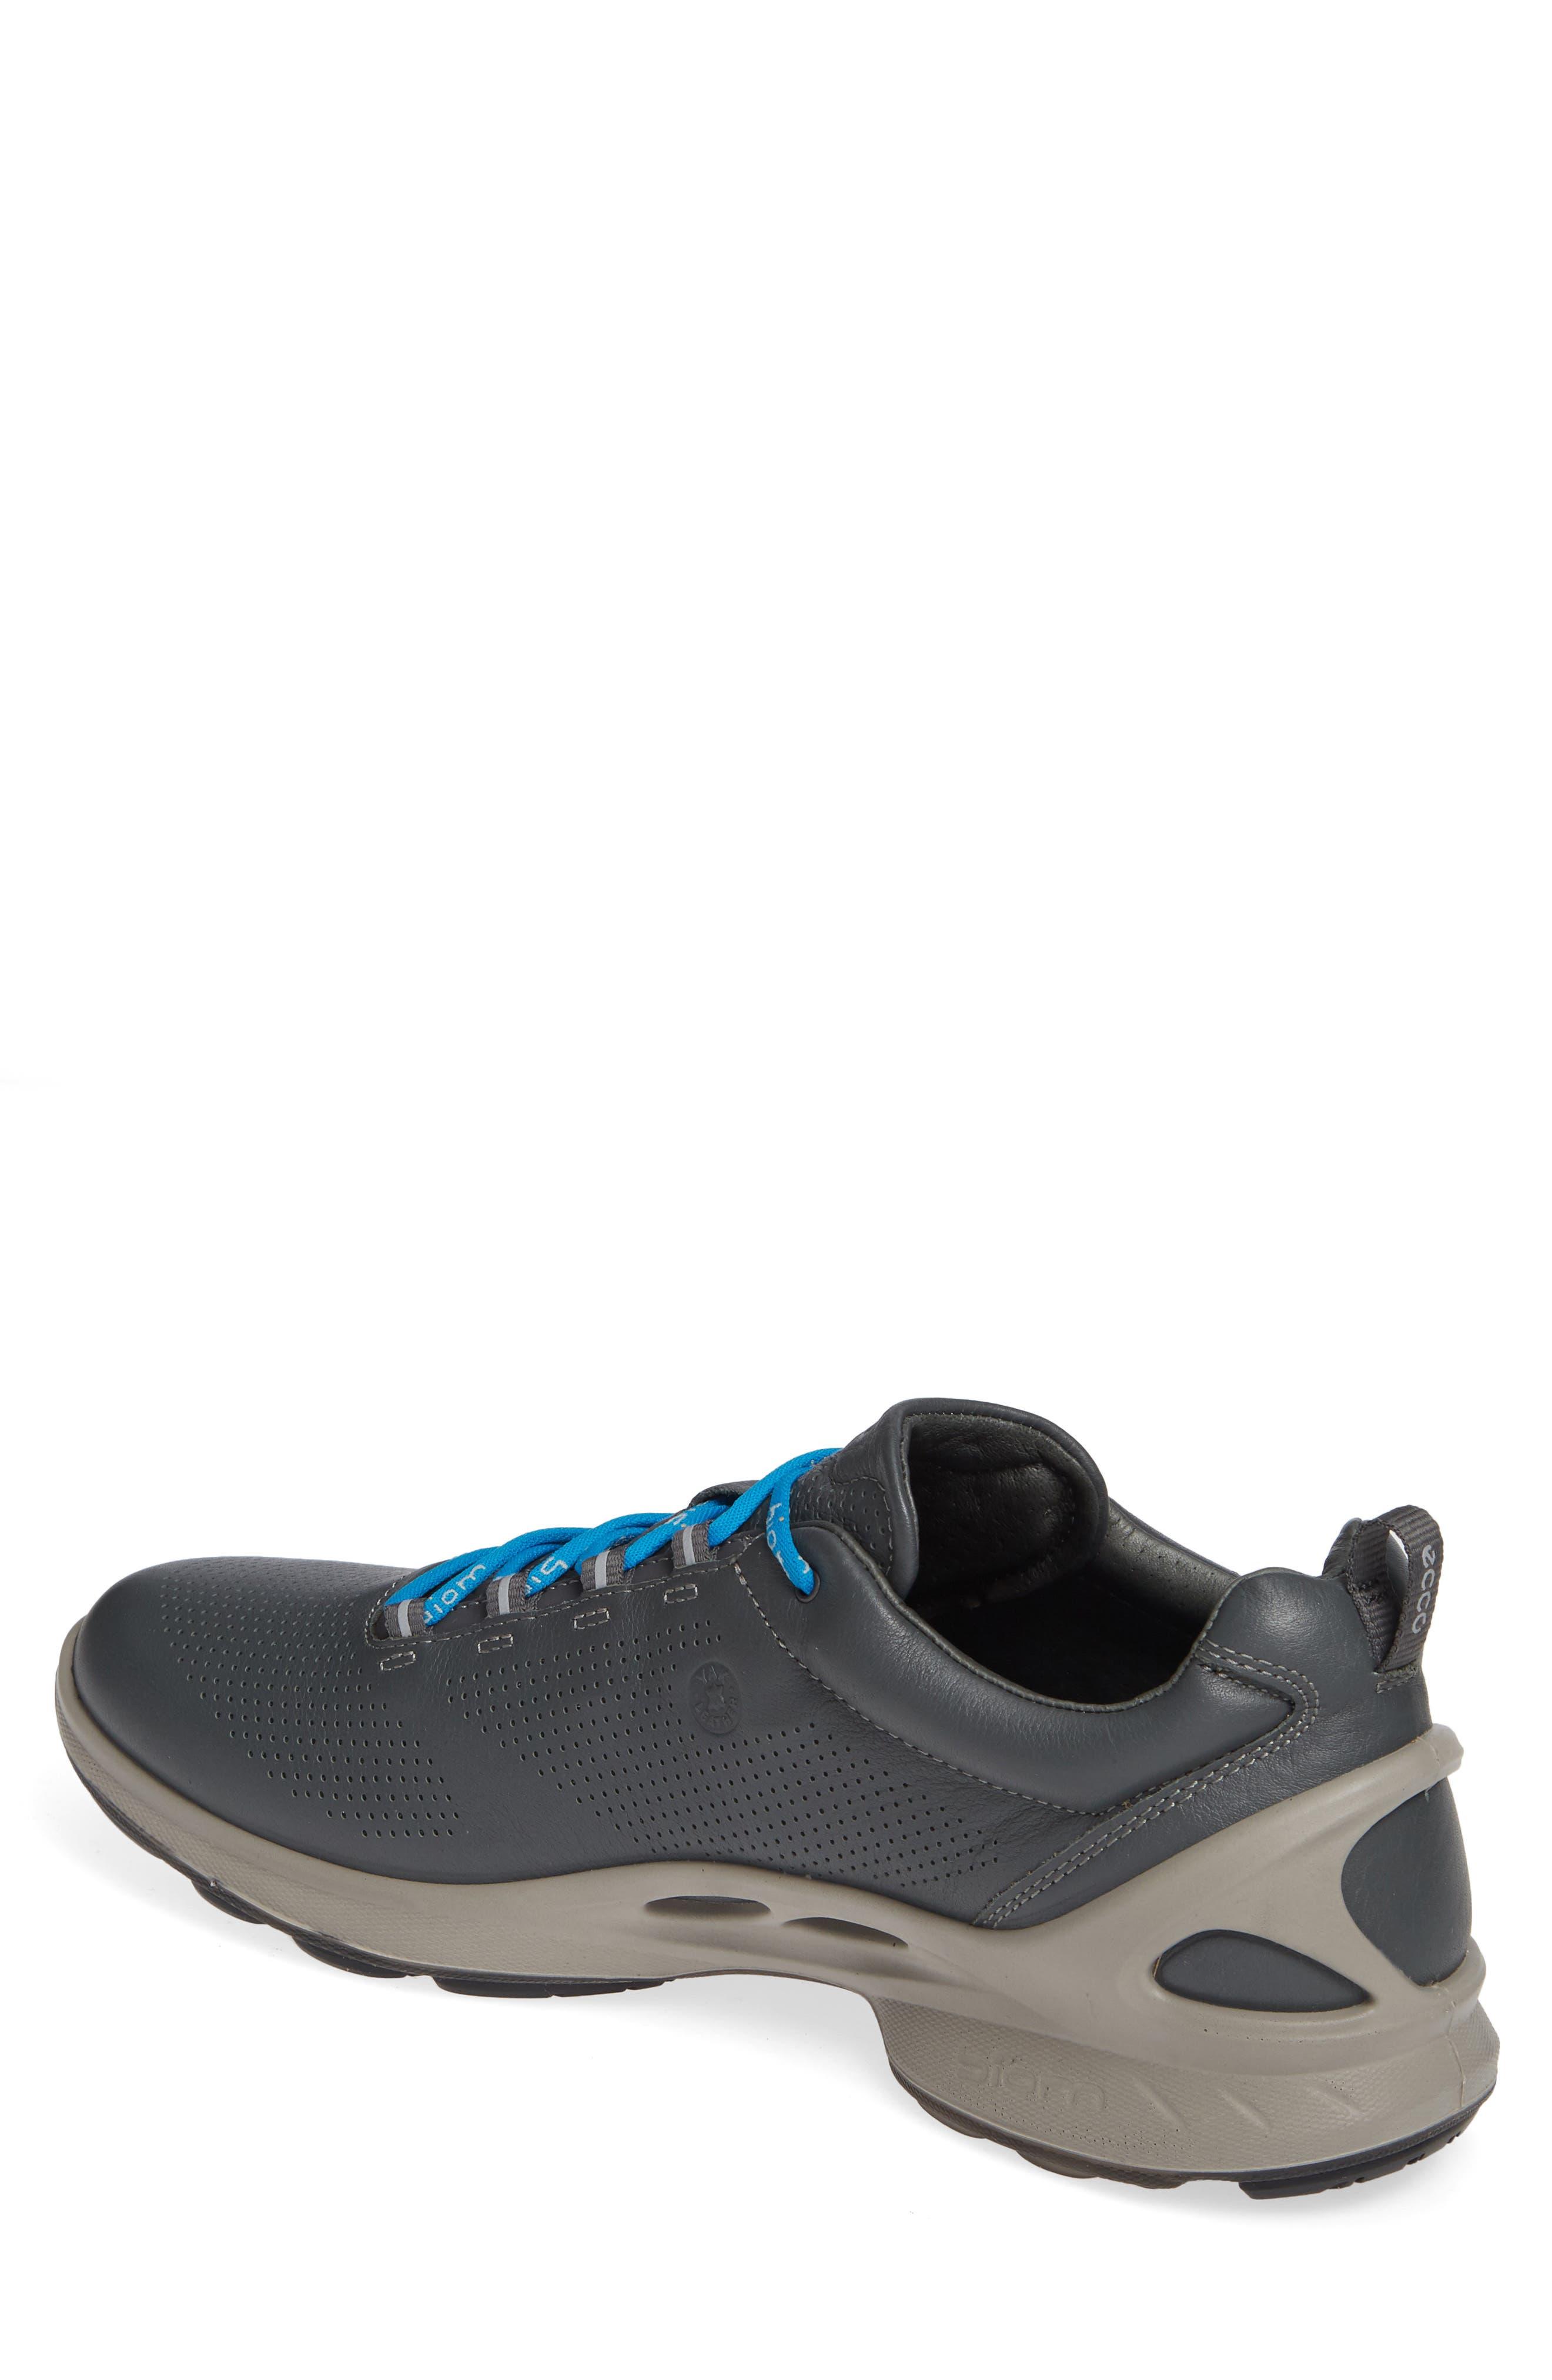 ECCO, 'BIOM Fjuel' Sneaker, Alternate thumbnail 2, color, DARK SHADOW LEATHER